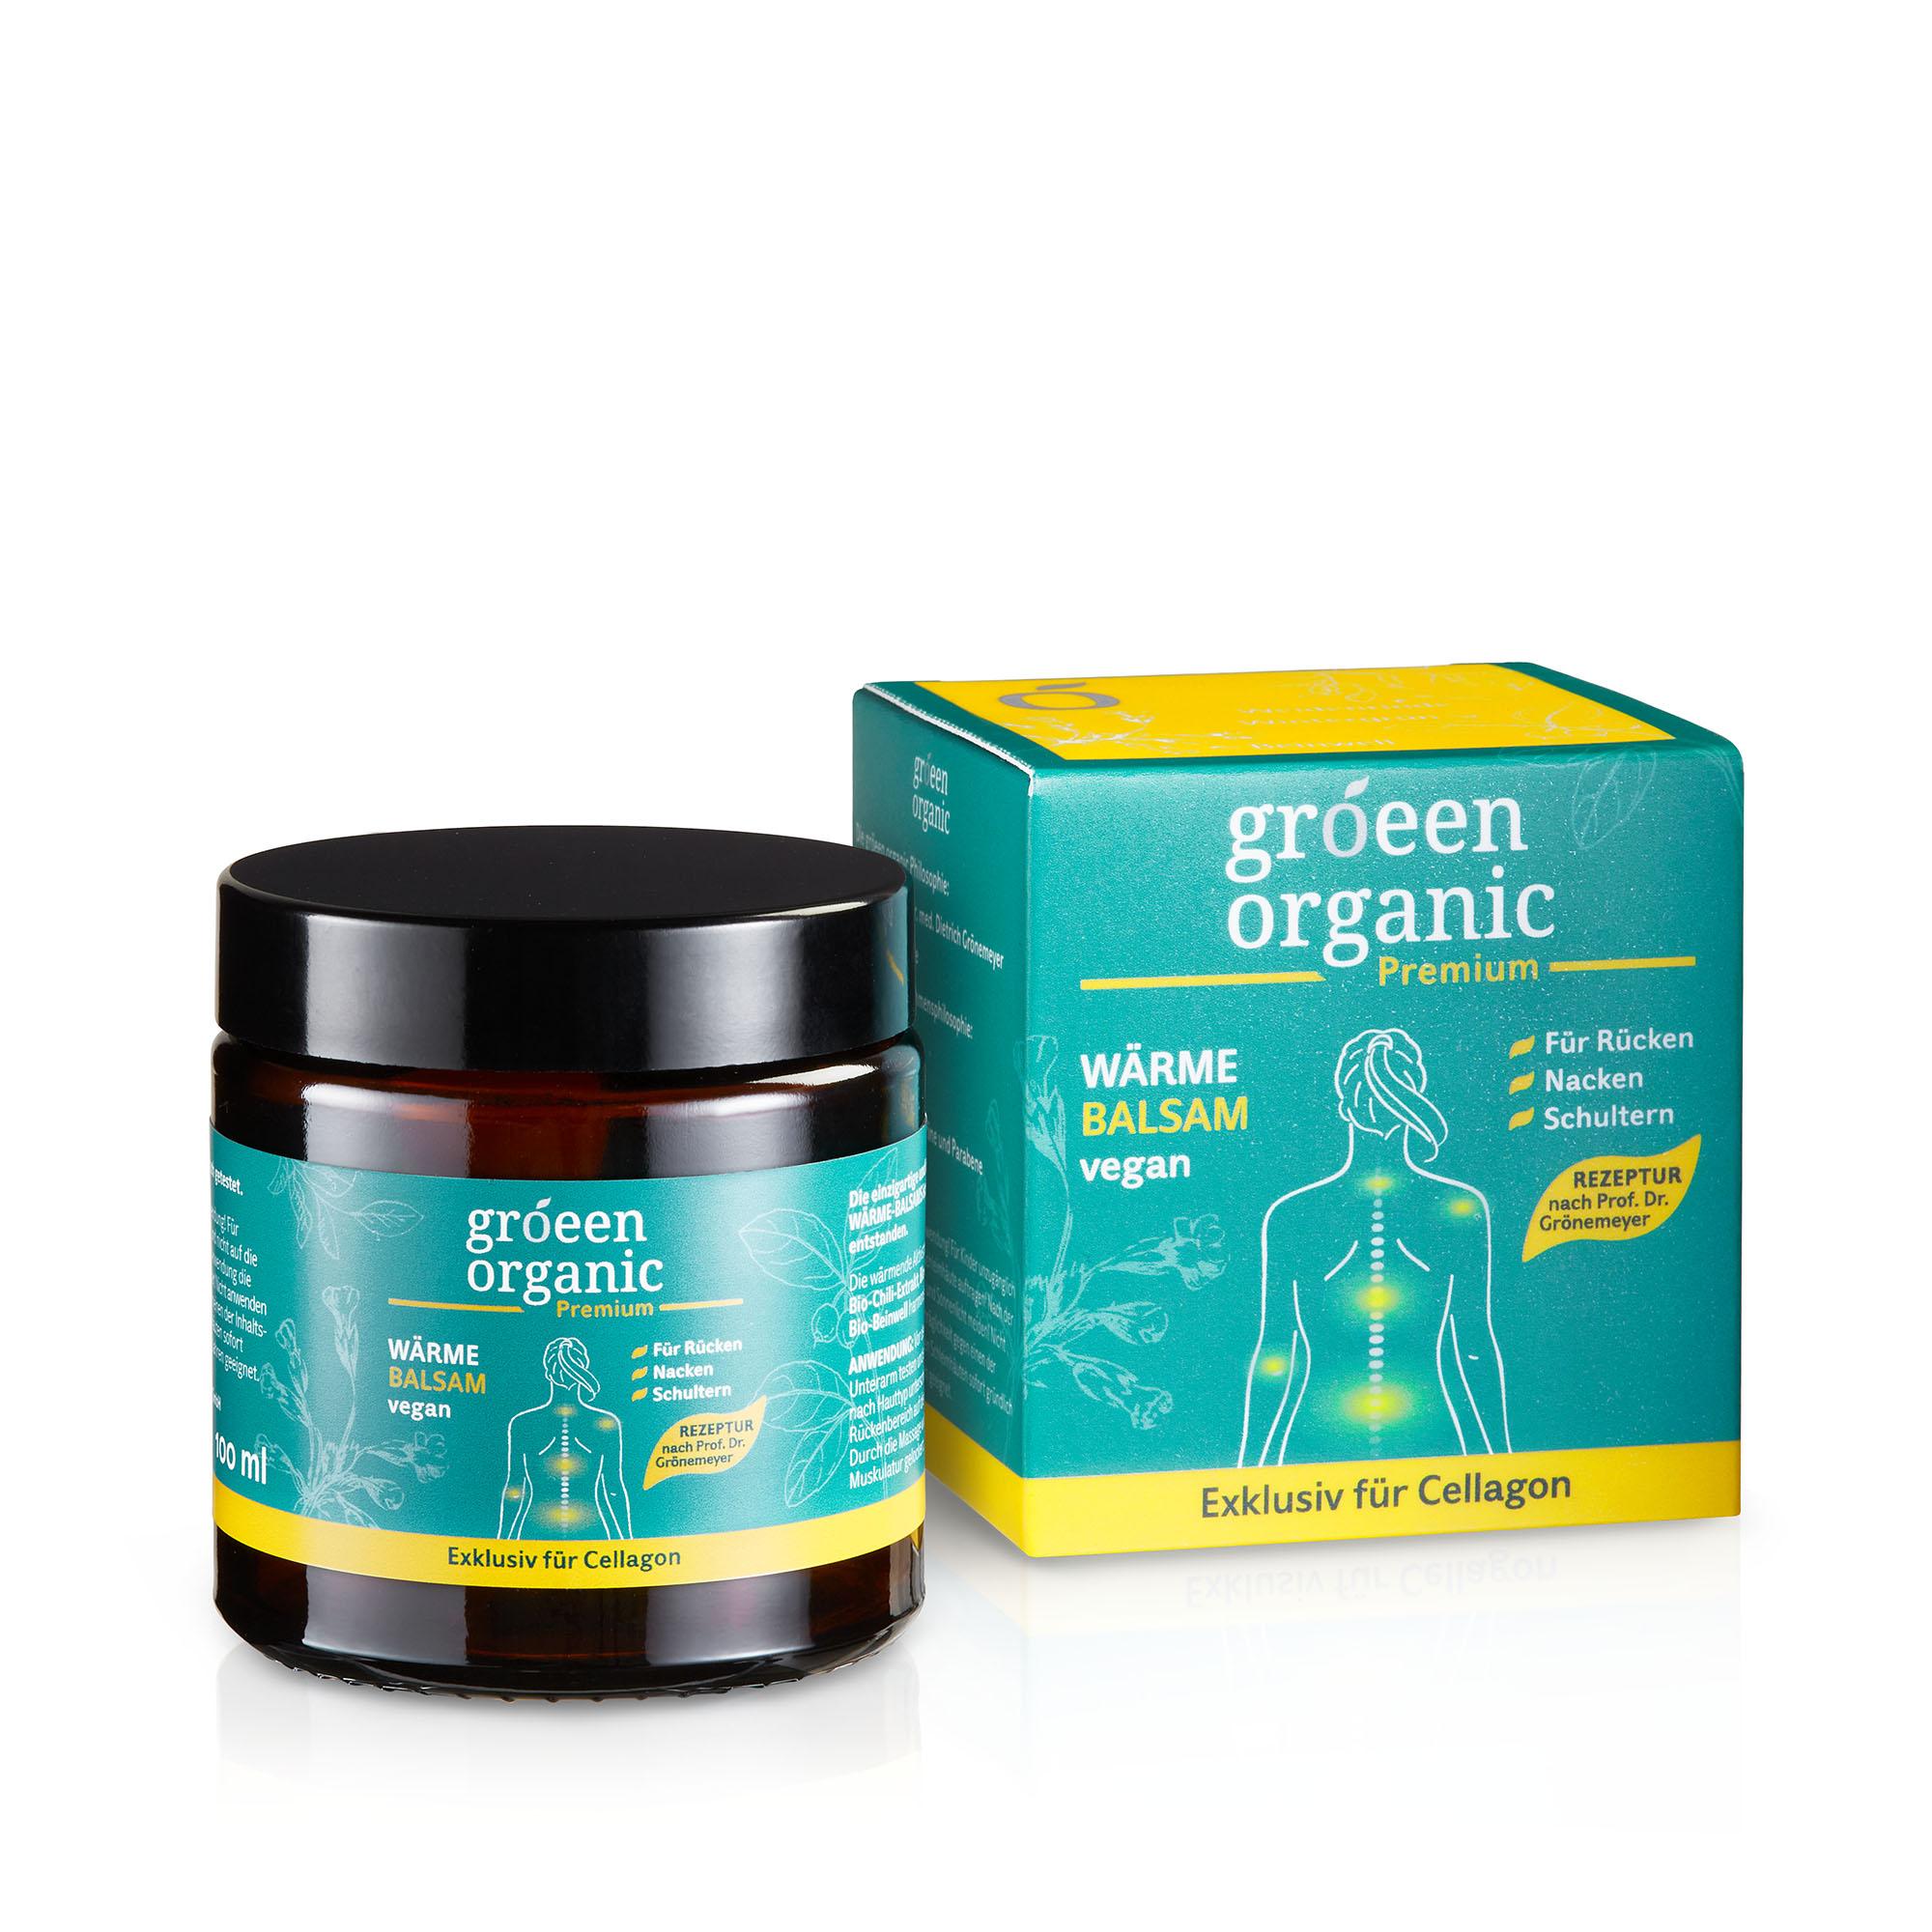 gröeen organic Premium Wärme-Balsam | Wellness-Produkte